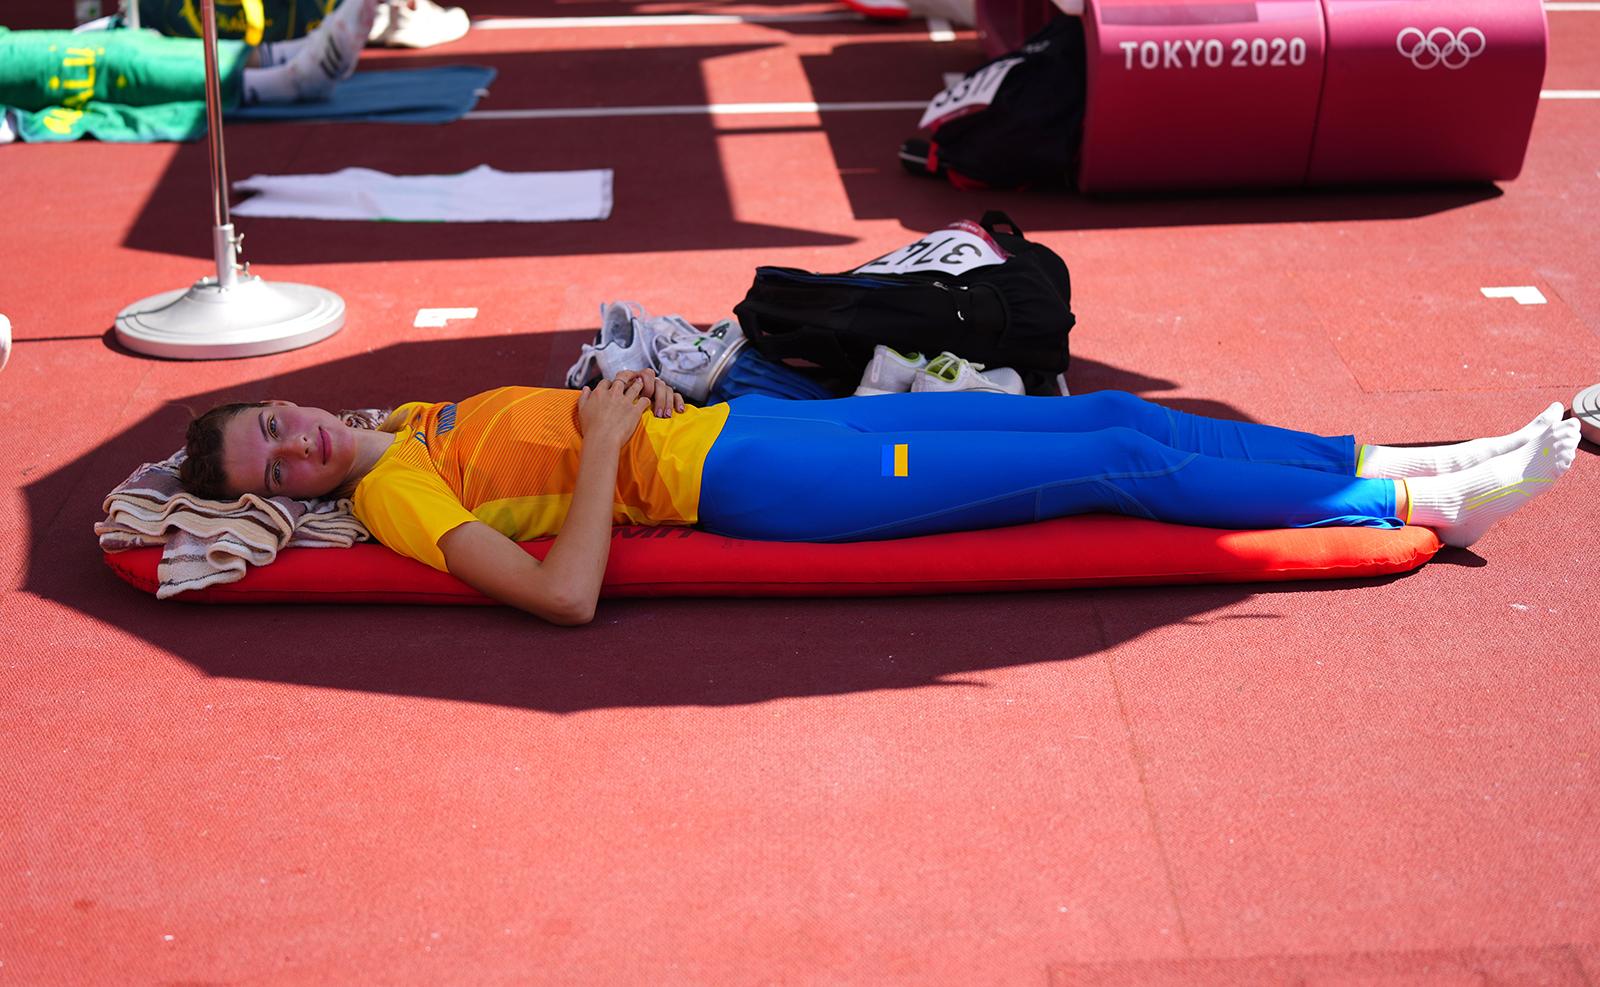 Tokyo 2020 Olympics - Athletics - Women's High Jump - Qualification - Olympic Stadium, Tokyo, Japan - August 5, 2021. Yaroslava Mahuchikh of Ukraine before competing. REUTERS